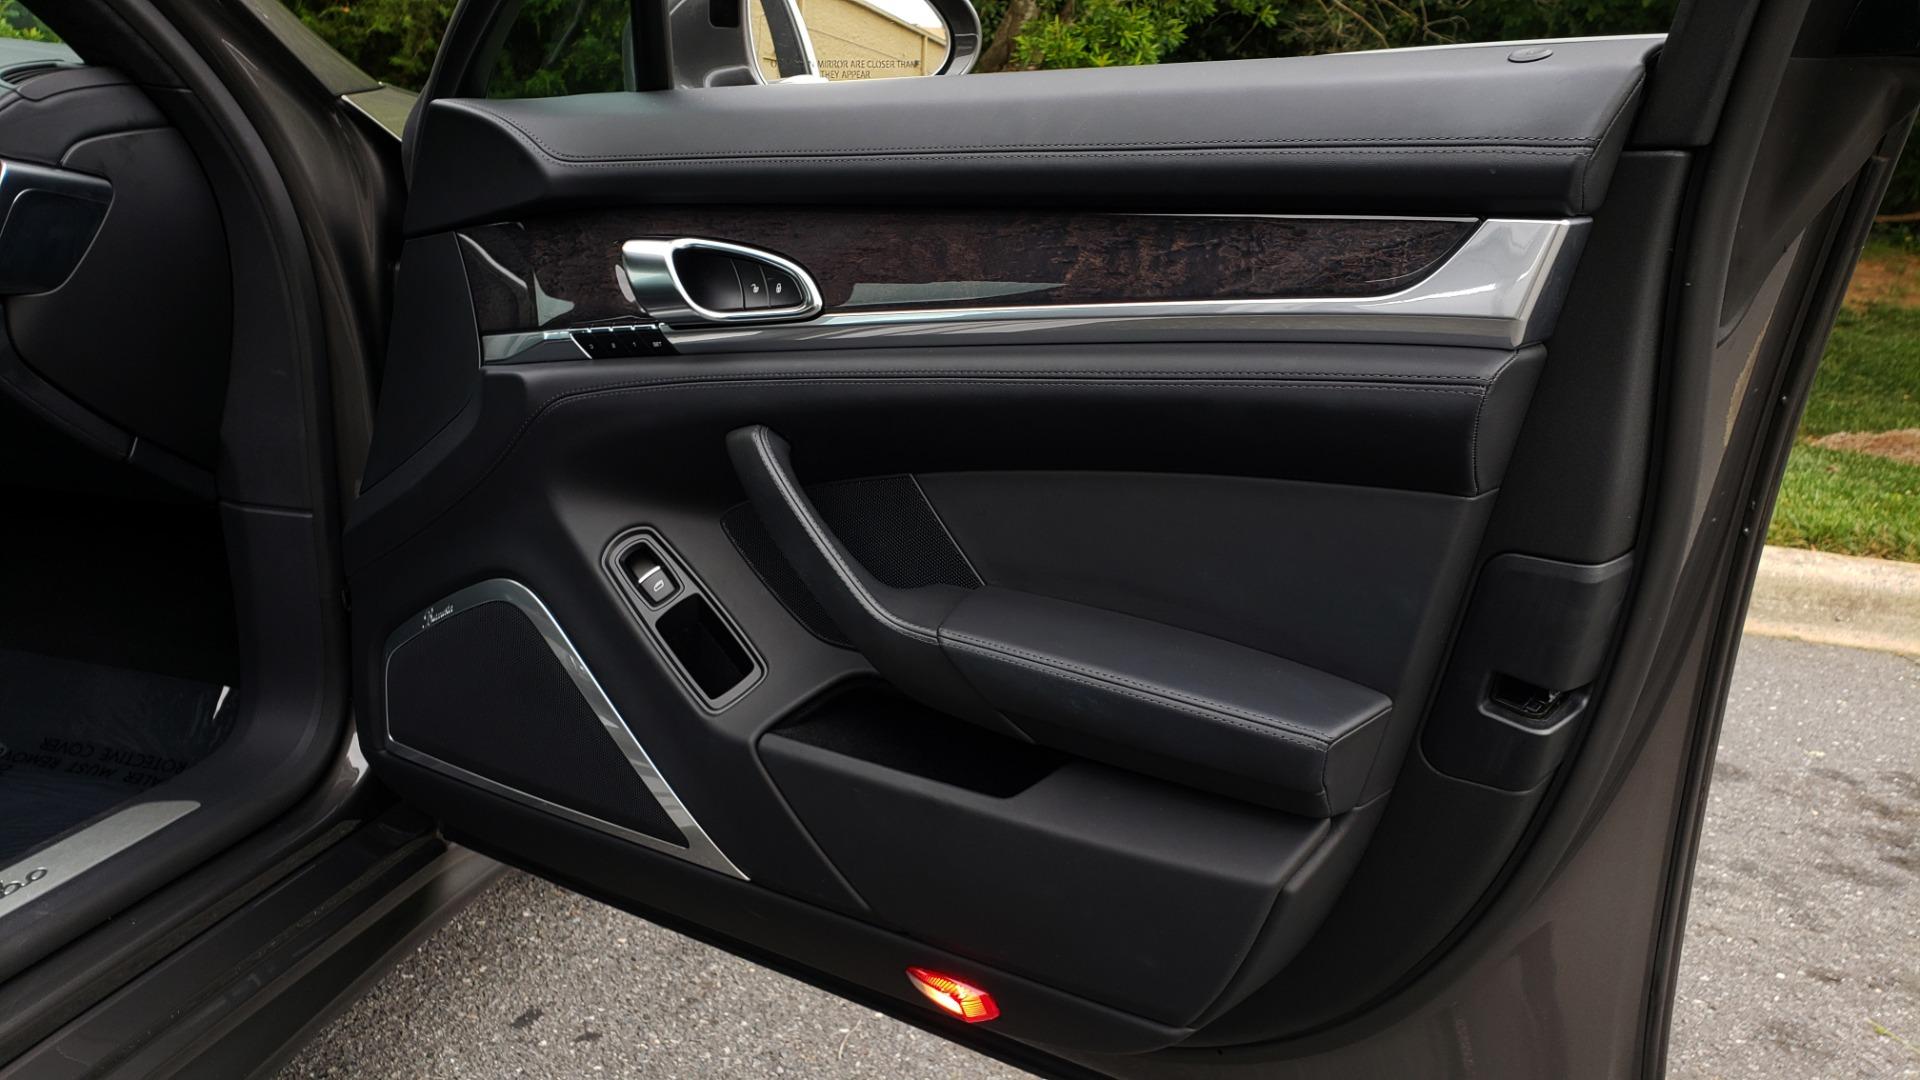 Used 2013 Porsche PANAMERA TURBO 4.8L V8 / AWD / NAV / SUNROOF / LCA / PARK ASST / BURMESTER for sale $45,995 at Formula Imports in Charlotte NC 28227 68